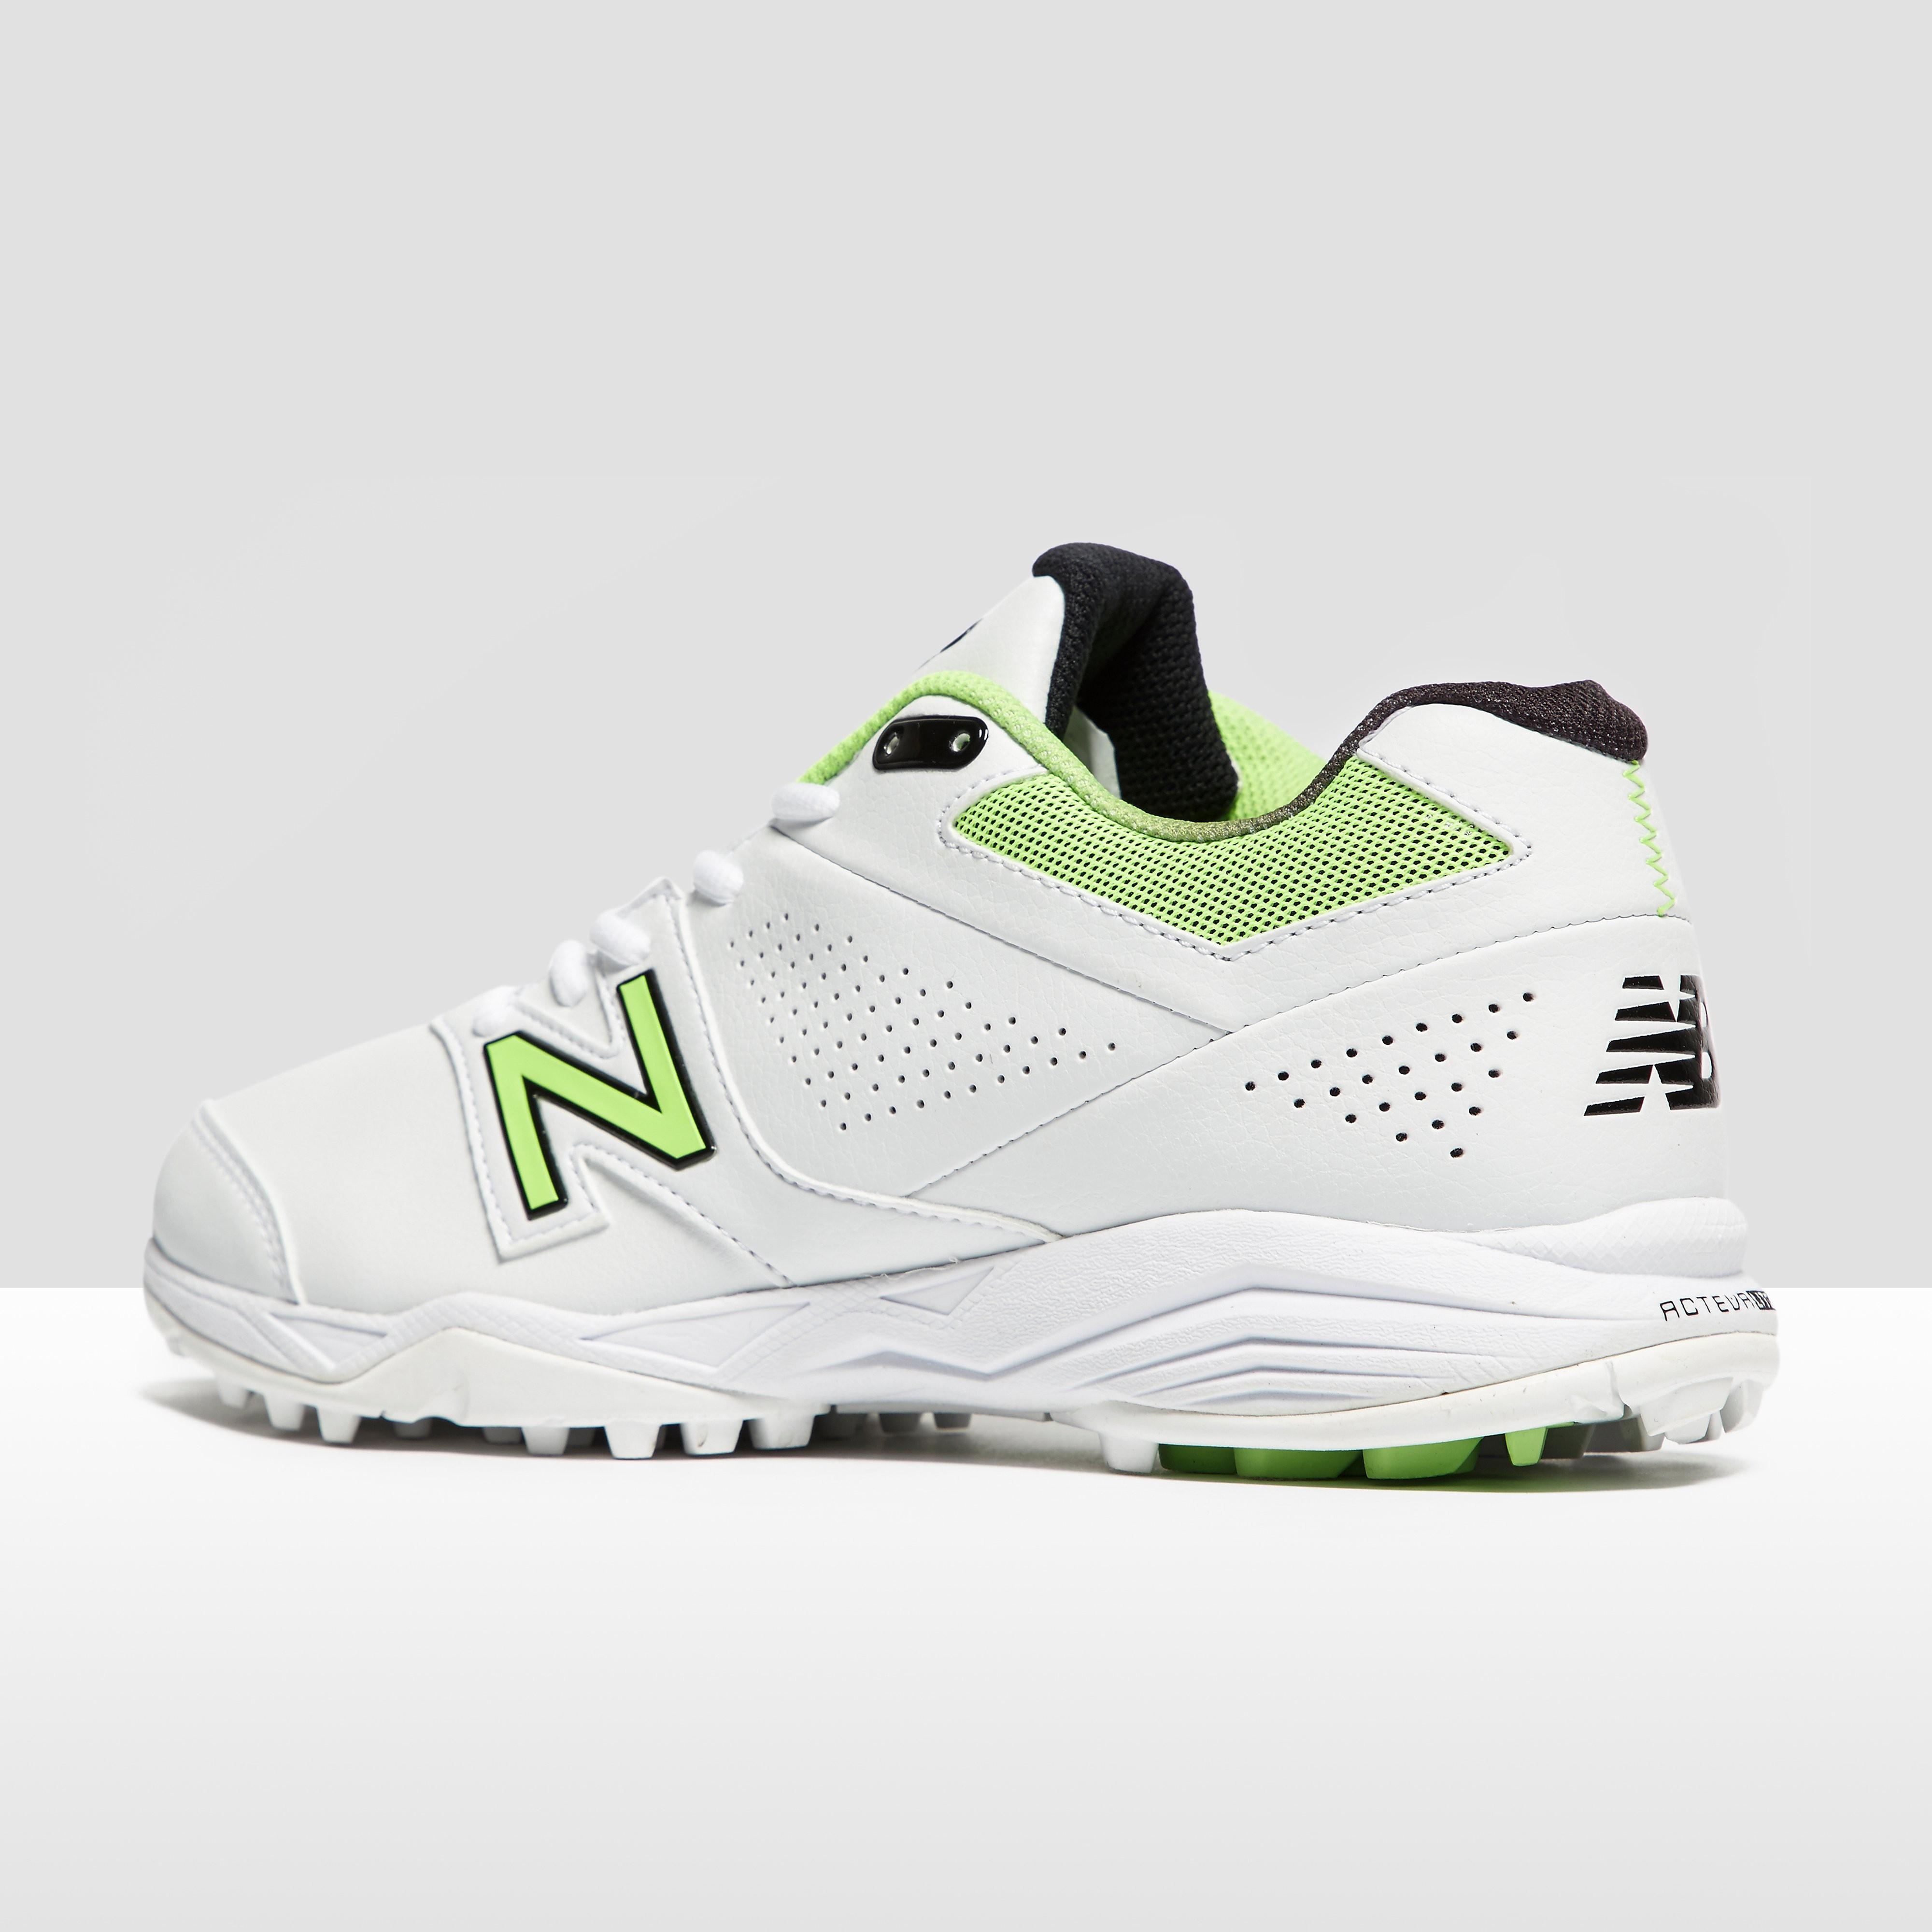 New Balance CK4020 Men's Cricket Shoes